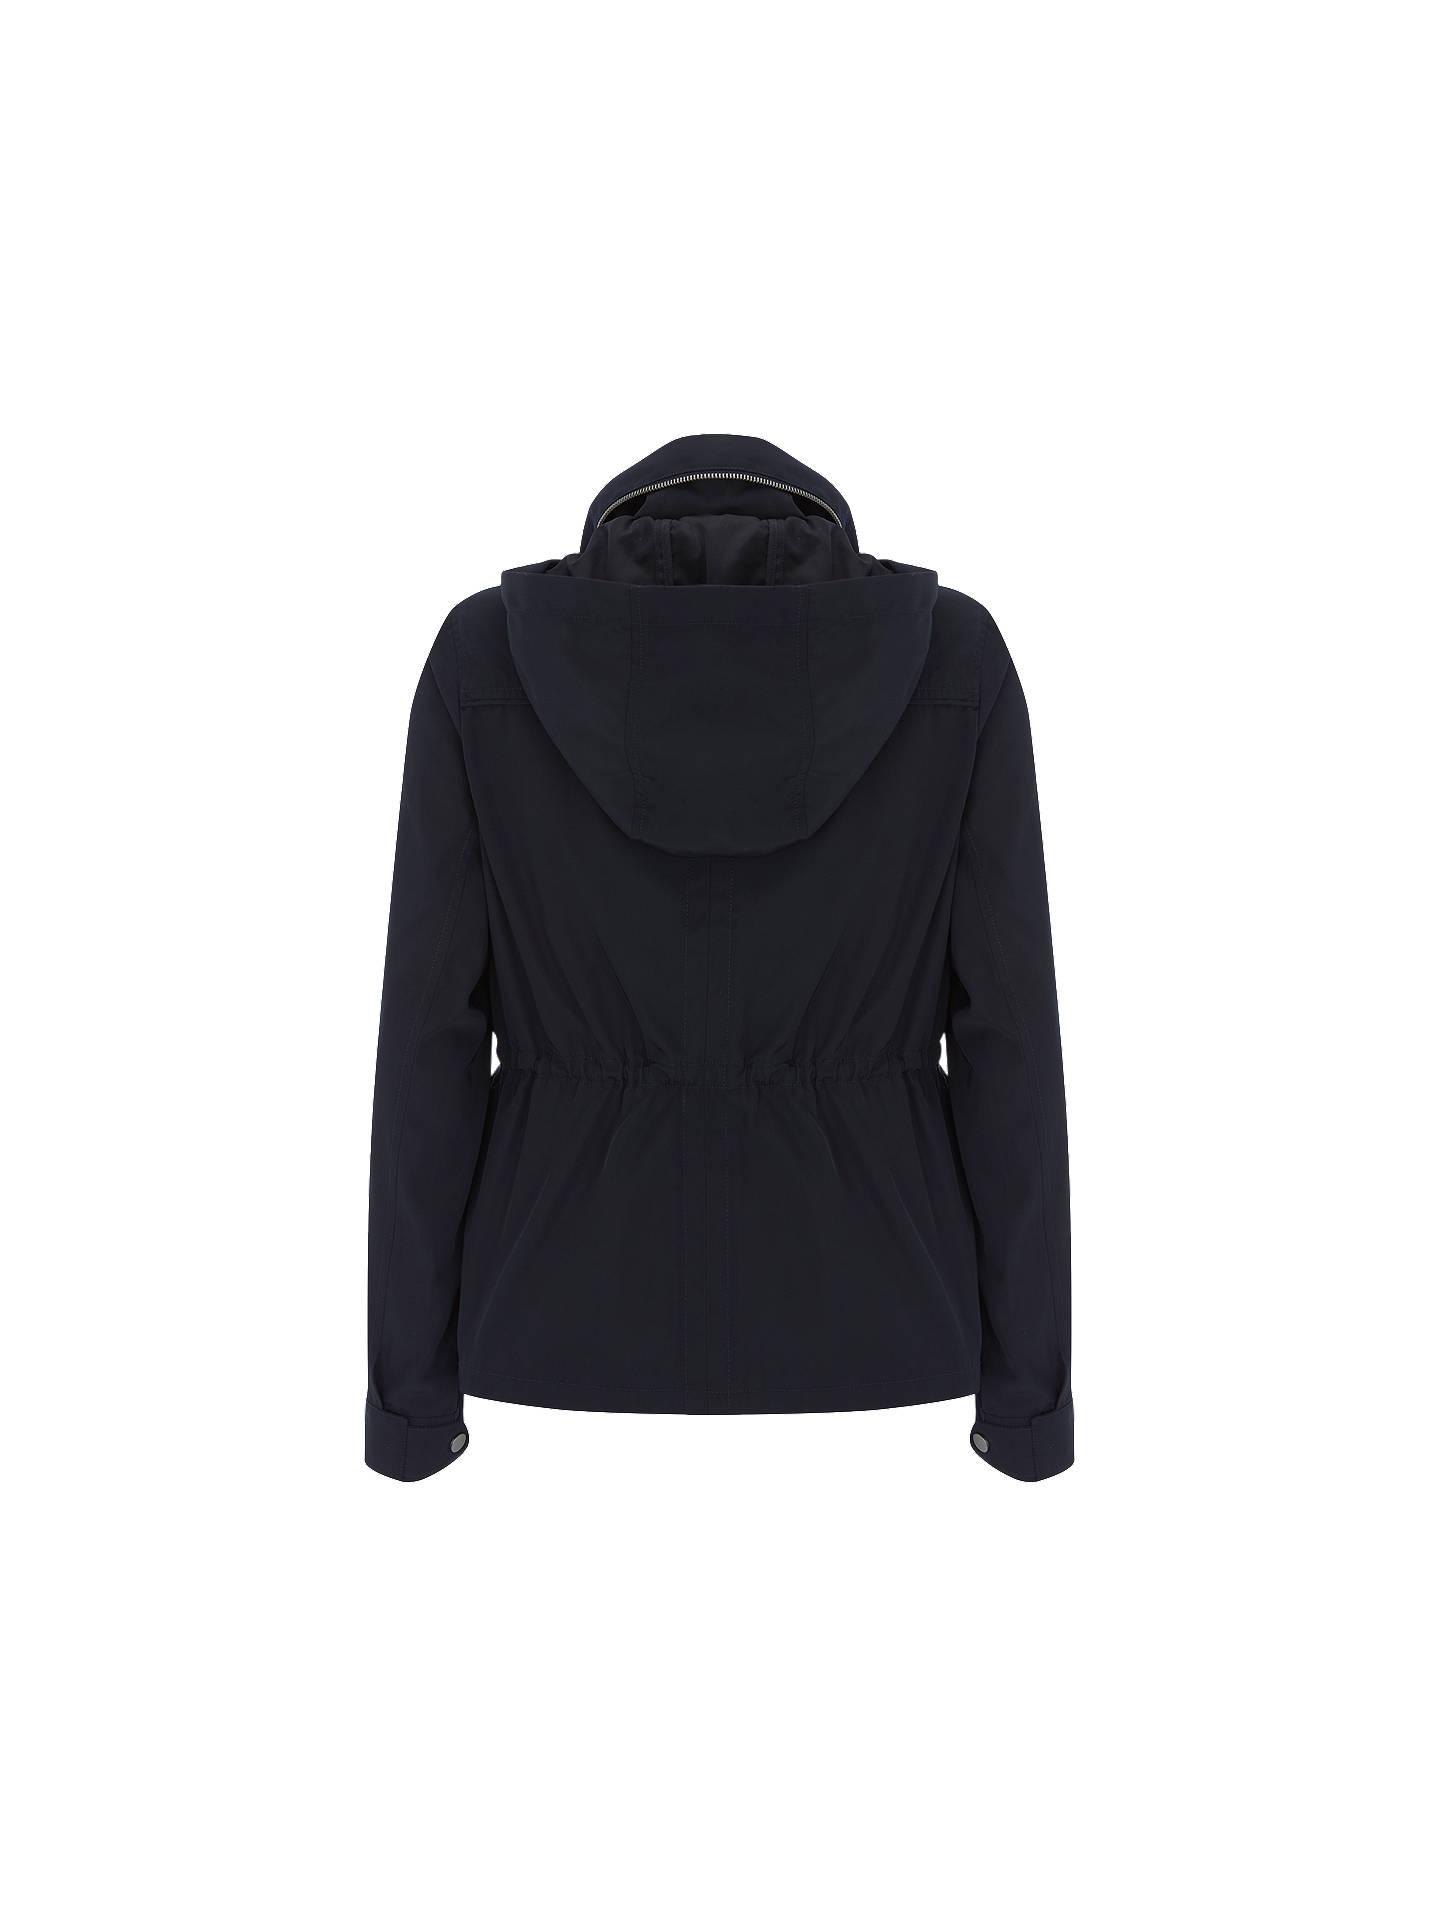 ac1832288 Mint Velvet Short Casual Zip Jacket, Dark Blue at John Lewis & Partners